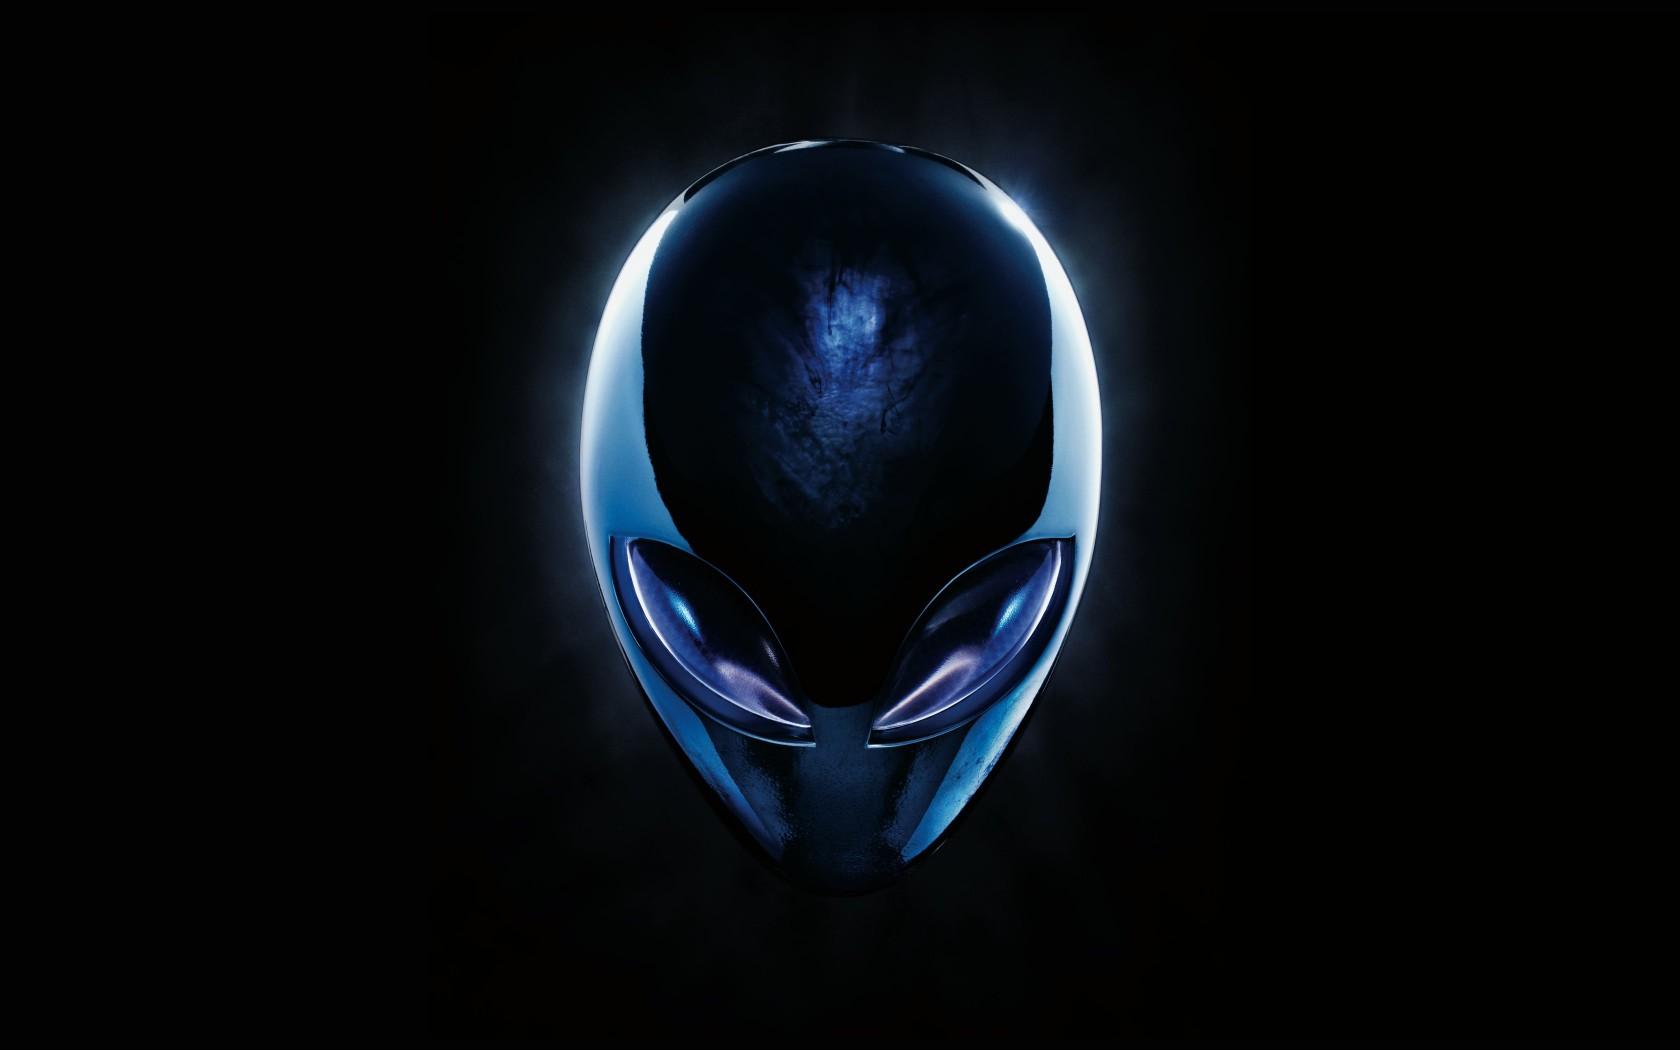 Blue Wallpaper Hd Download Alienware Blue Logo Hd Wallpaper For 1680x1050 Screens